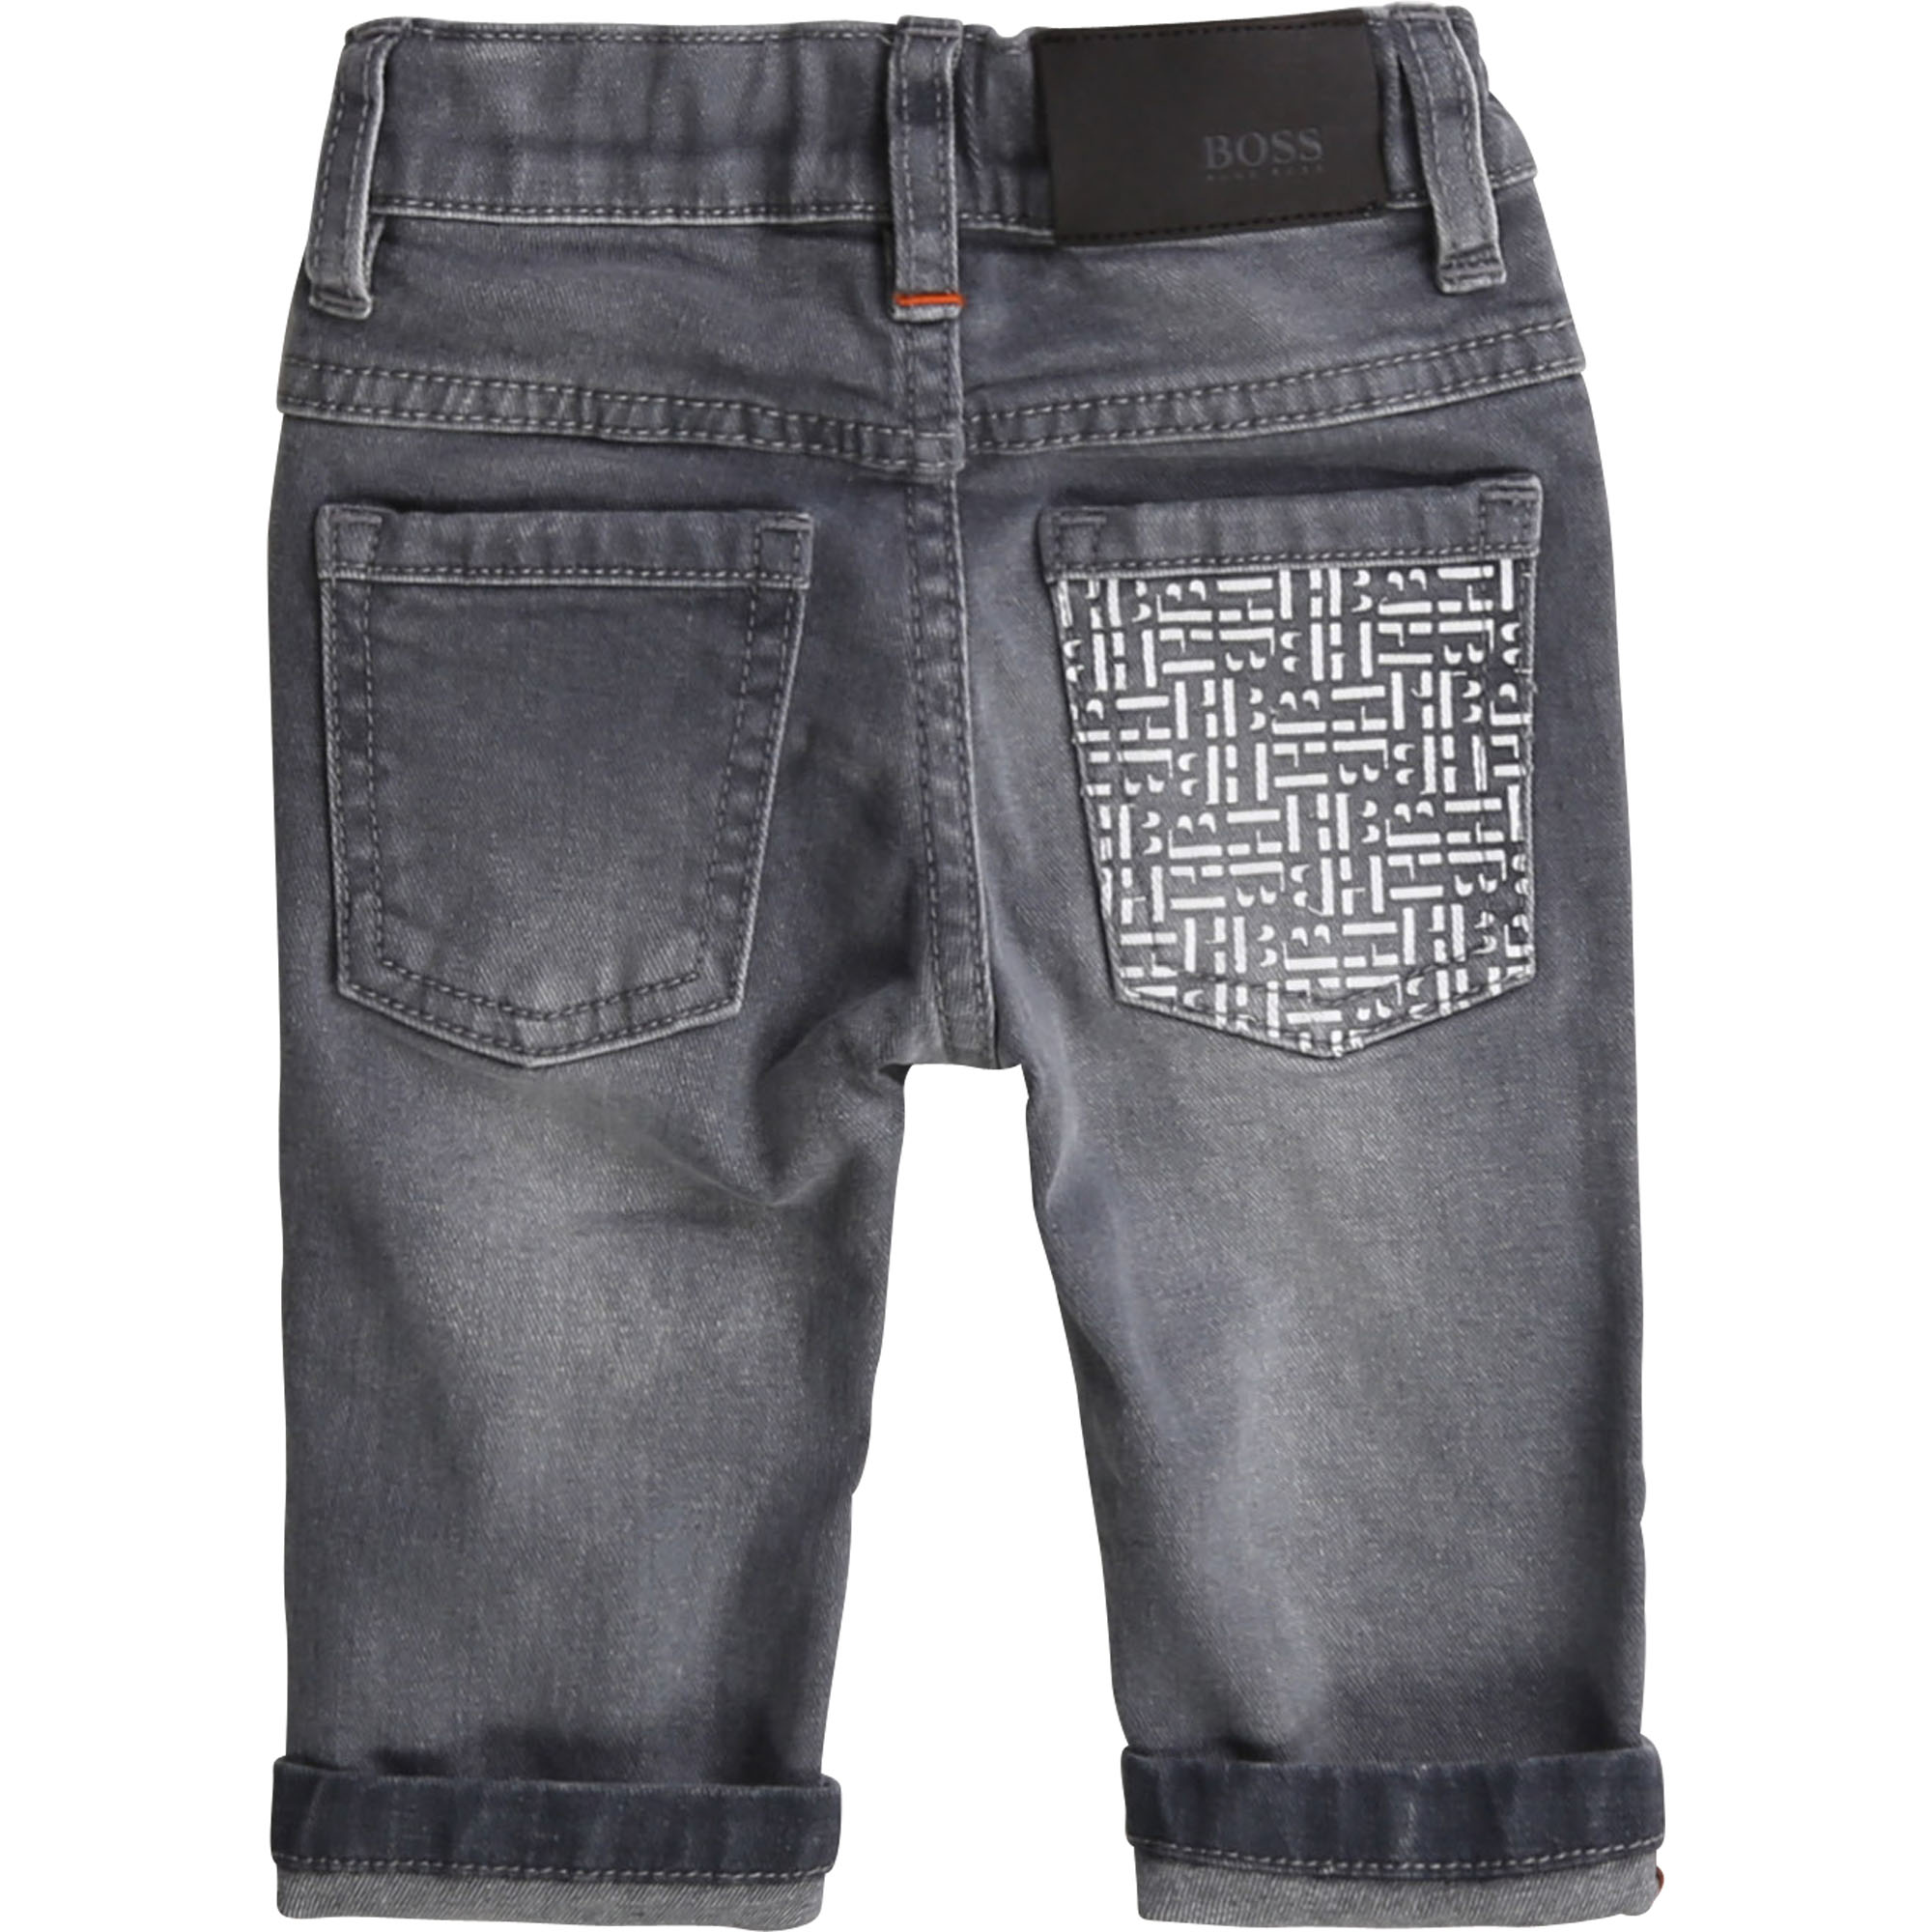 Stretch cotton denim jeans BOSS for BOY